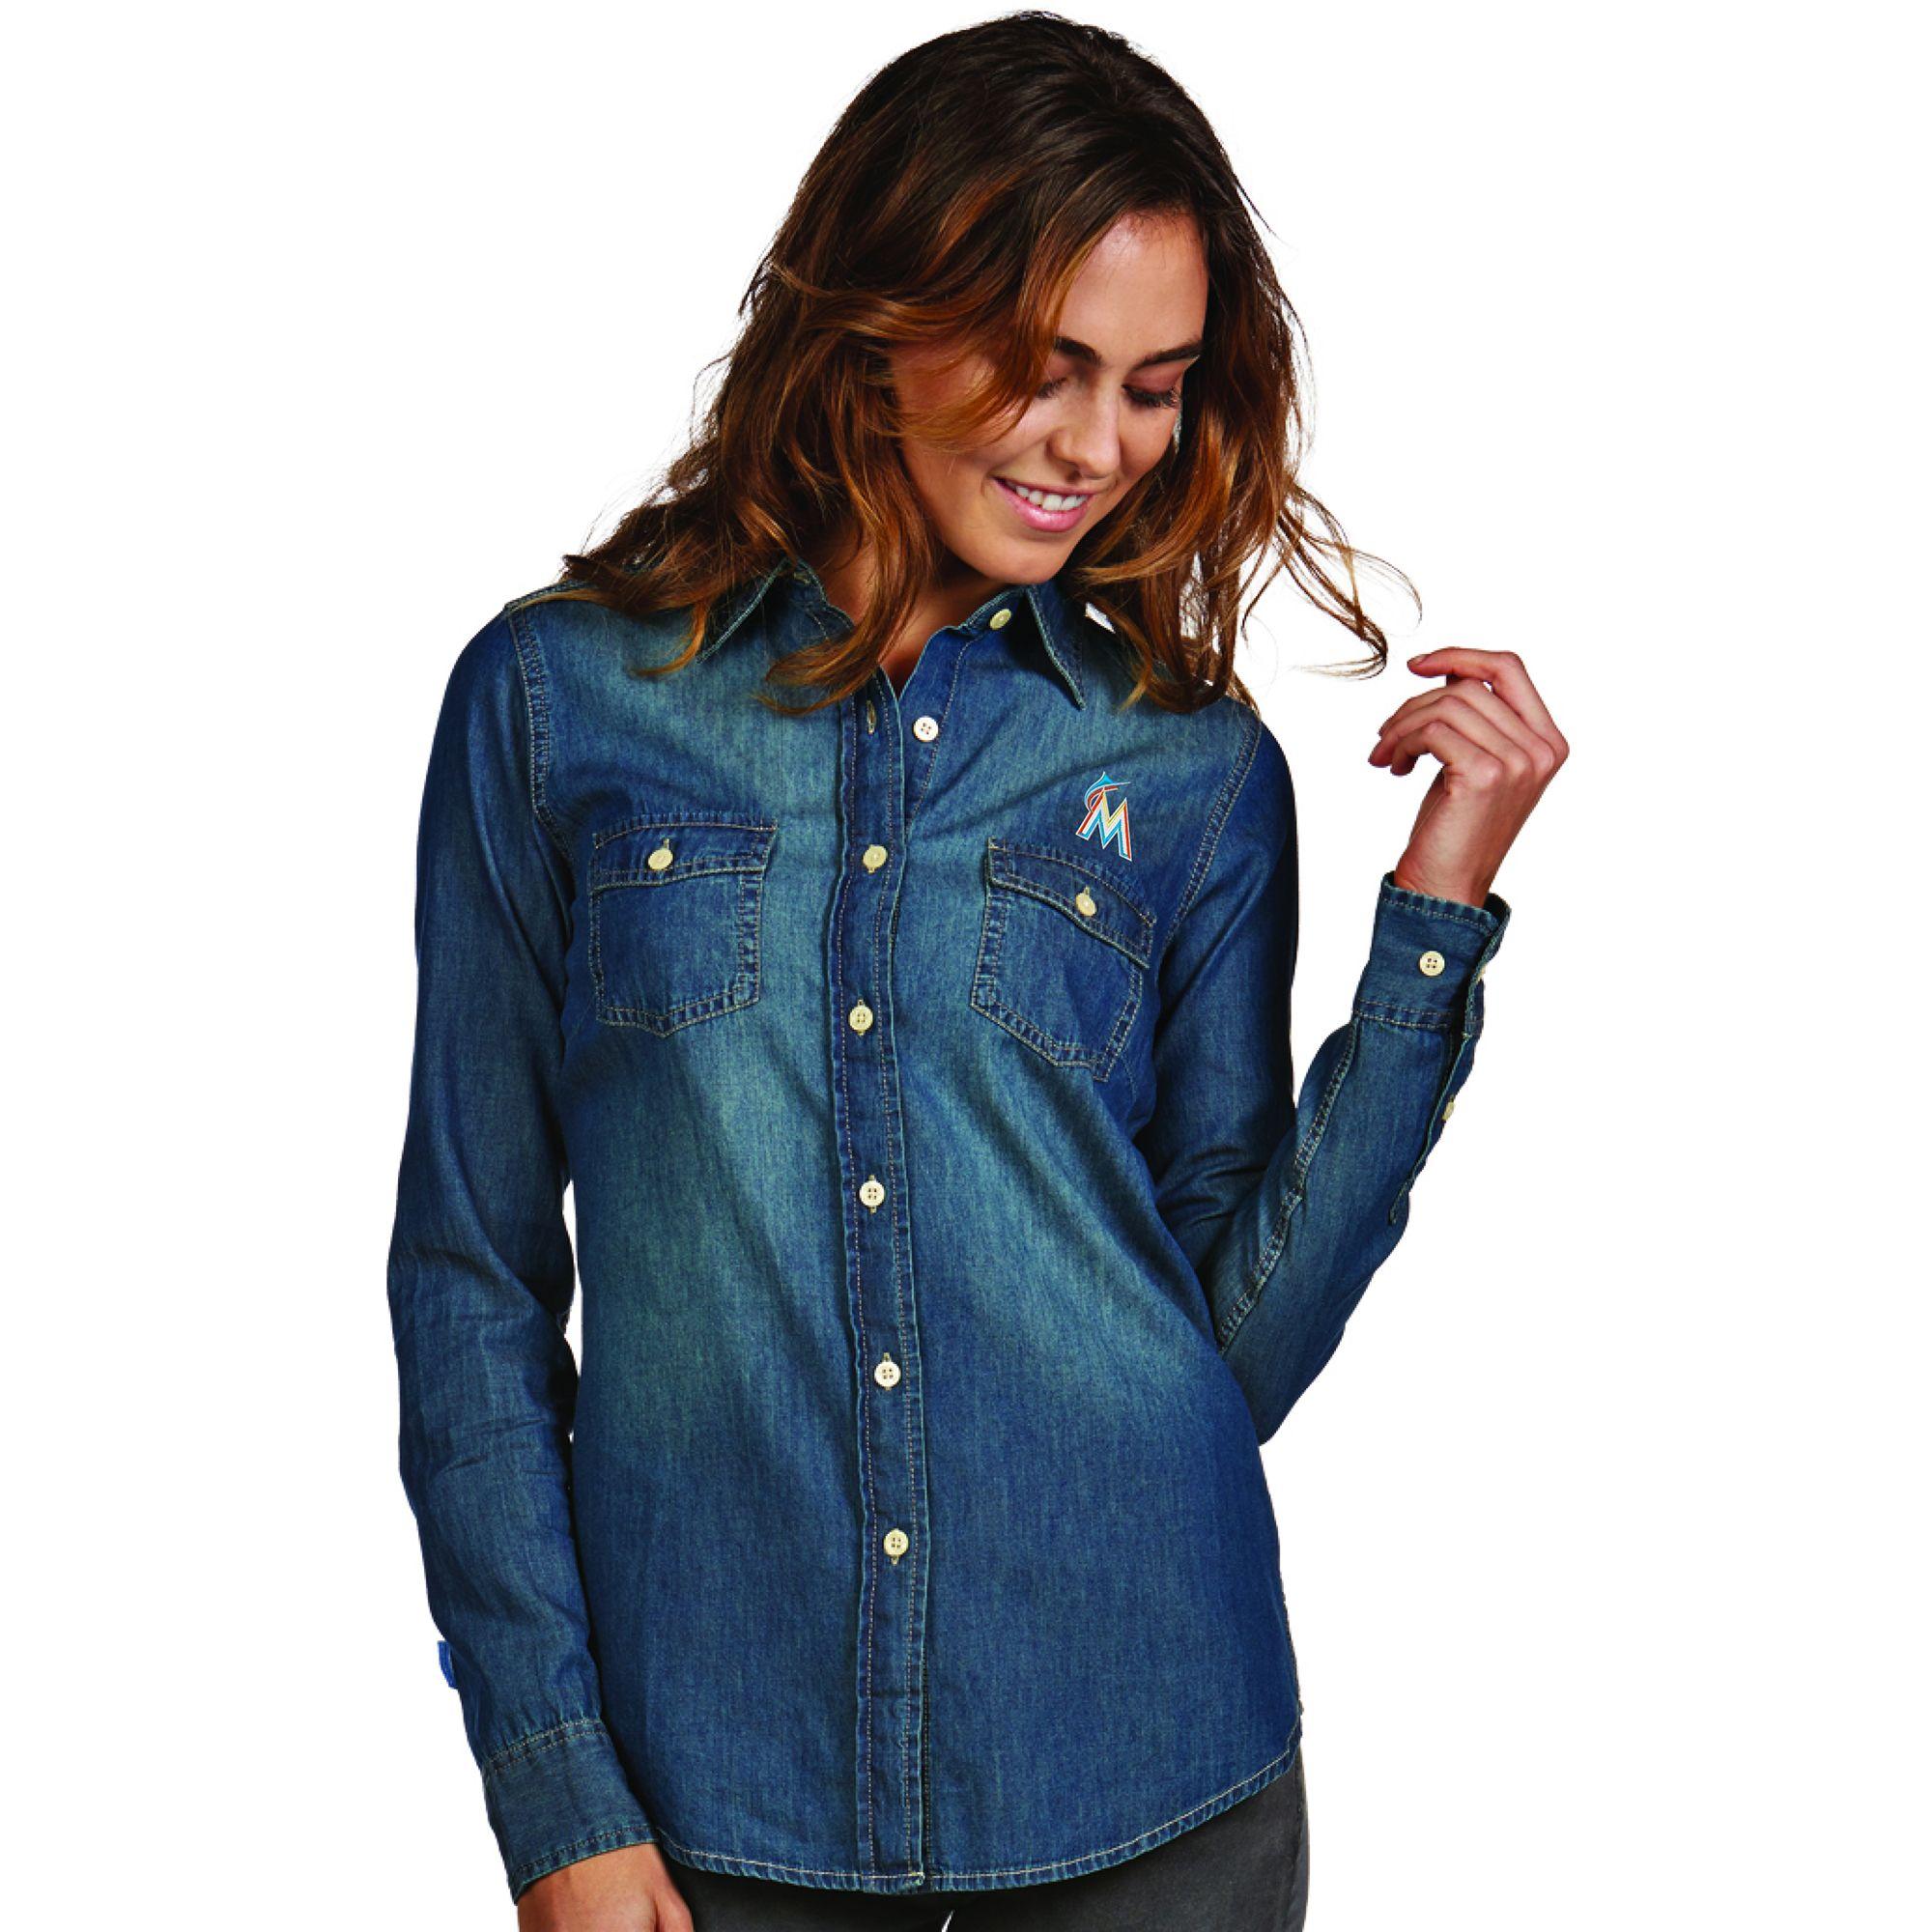 MLB Miami Marlins Antigua Women's Chambray Long Sleeve Shirt - Blue